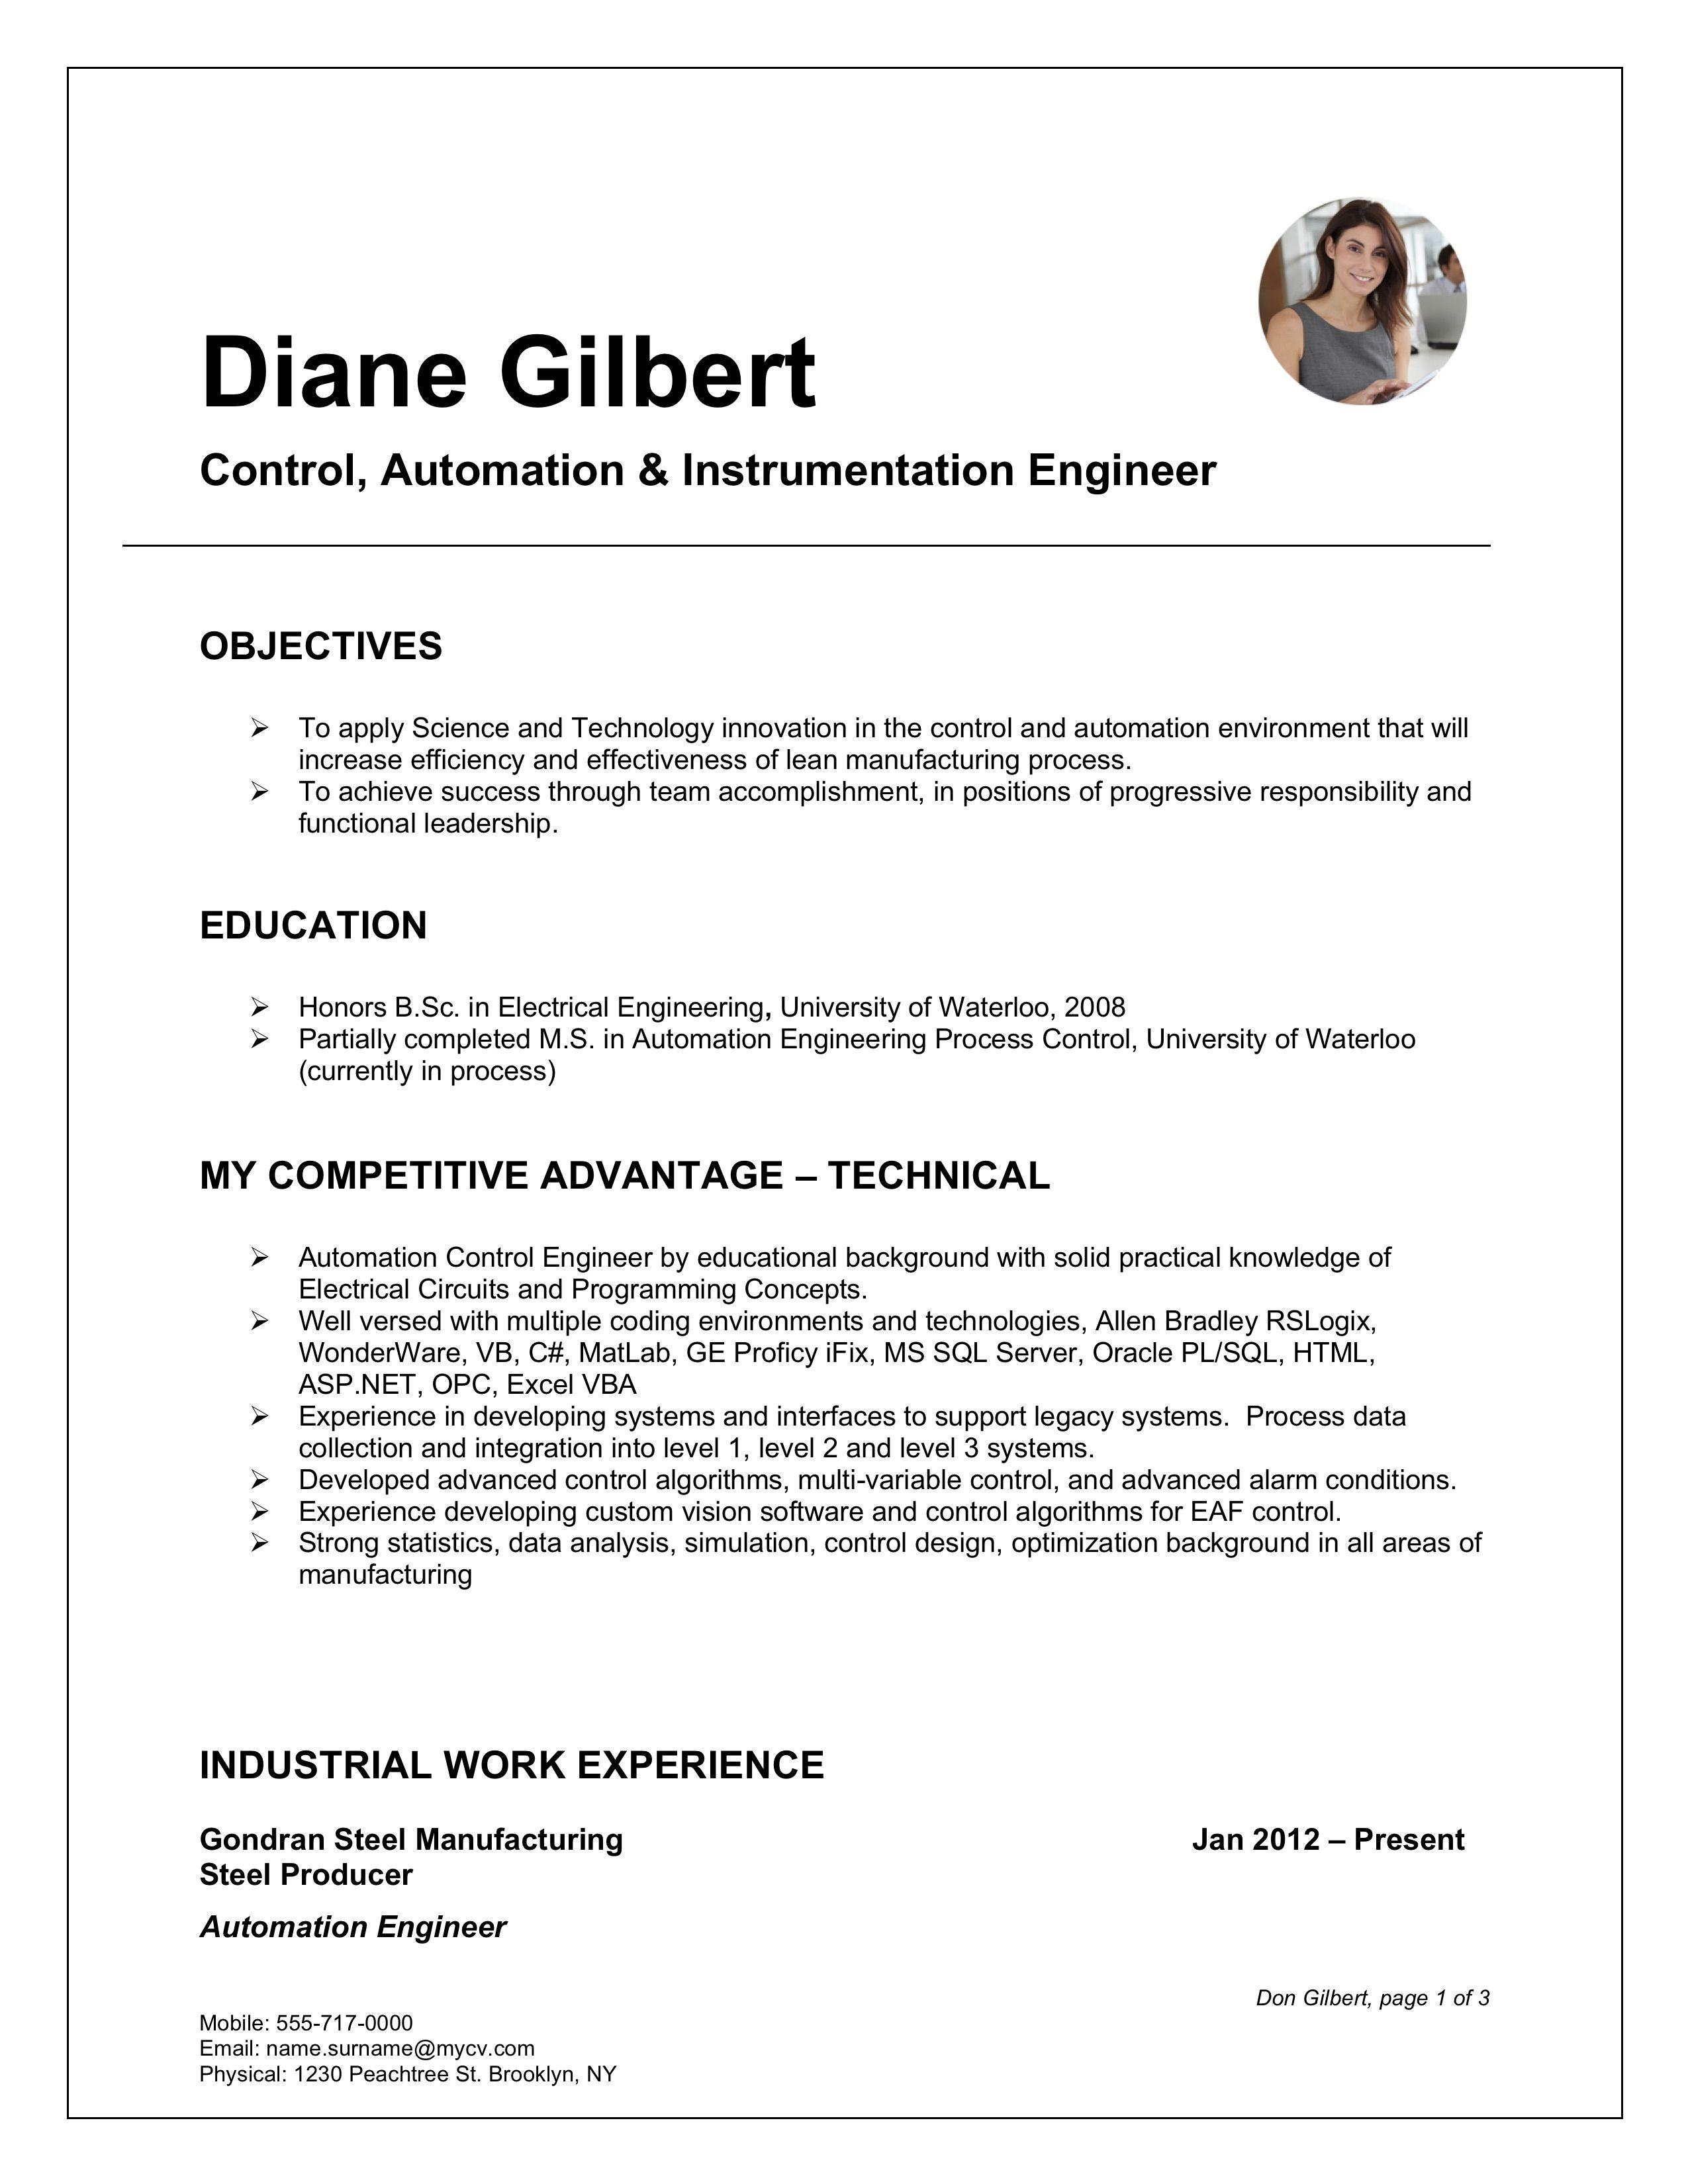 Free ms word resume template microsoft word resume